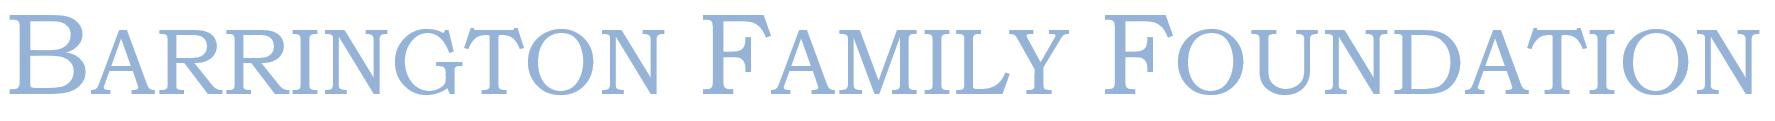 Barrington Family Foundation Logo-2.jpg